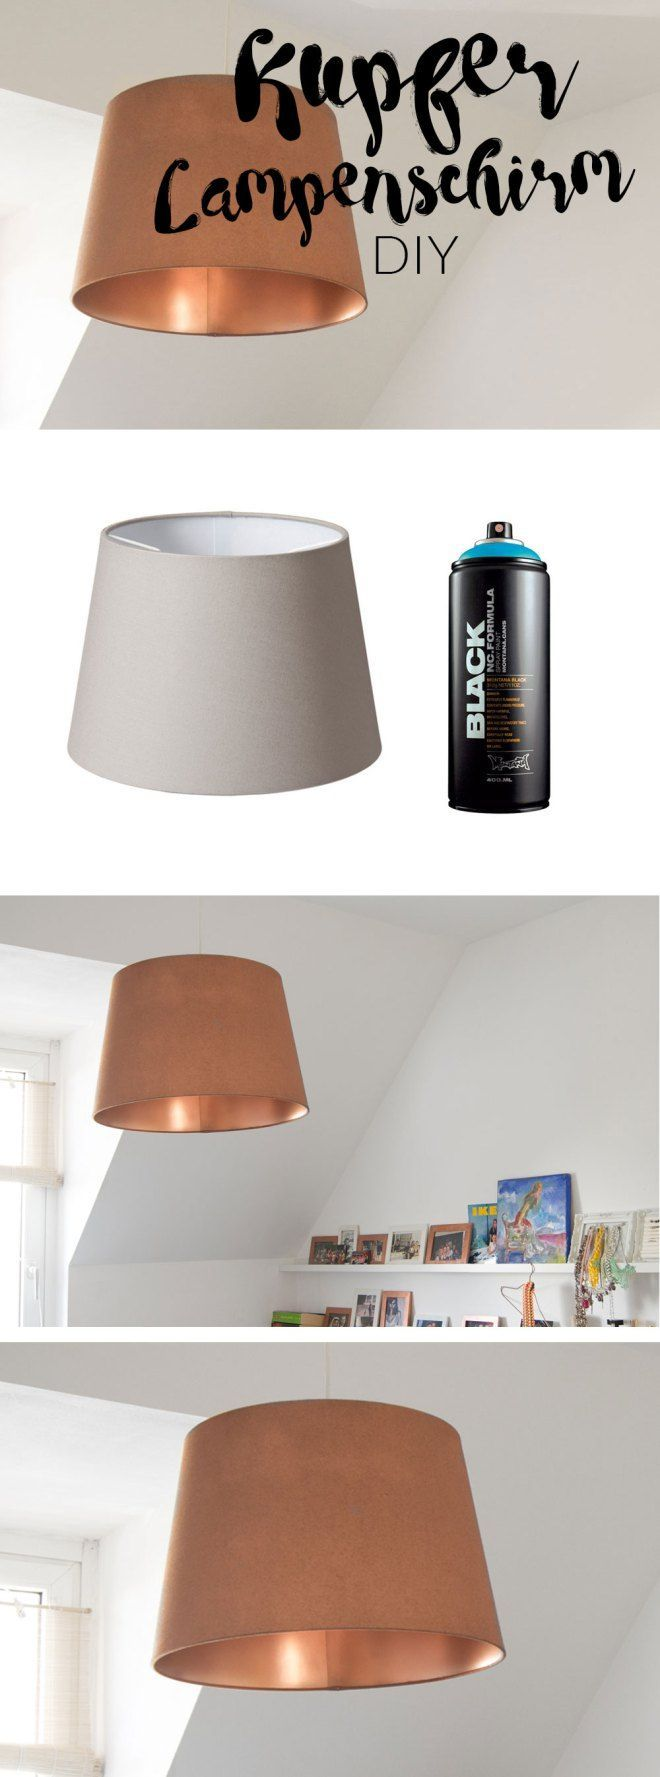 Lila esszimmer dekor  best interior design images on pinterest  bedrooms bedroom and